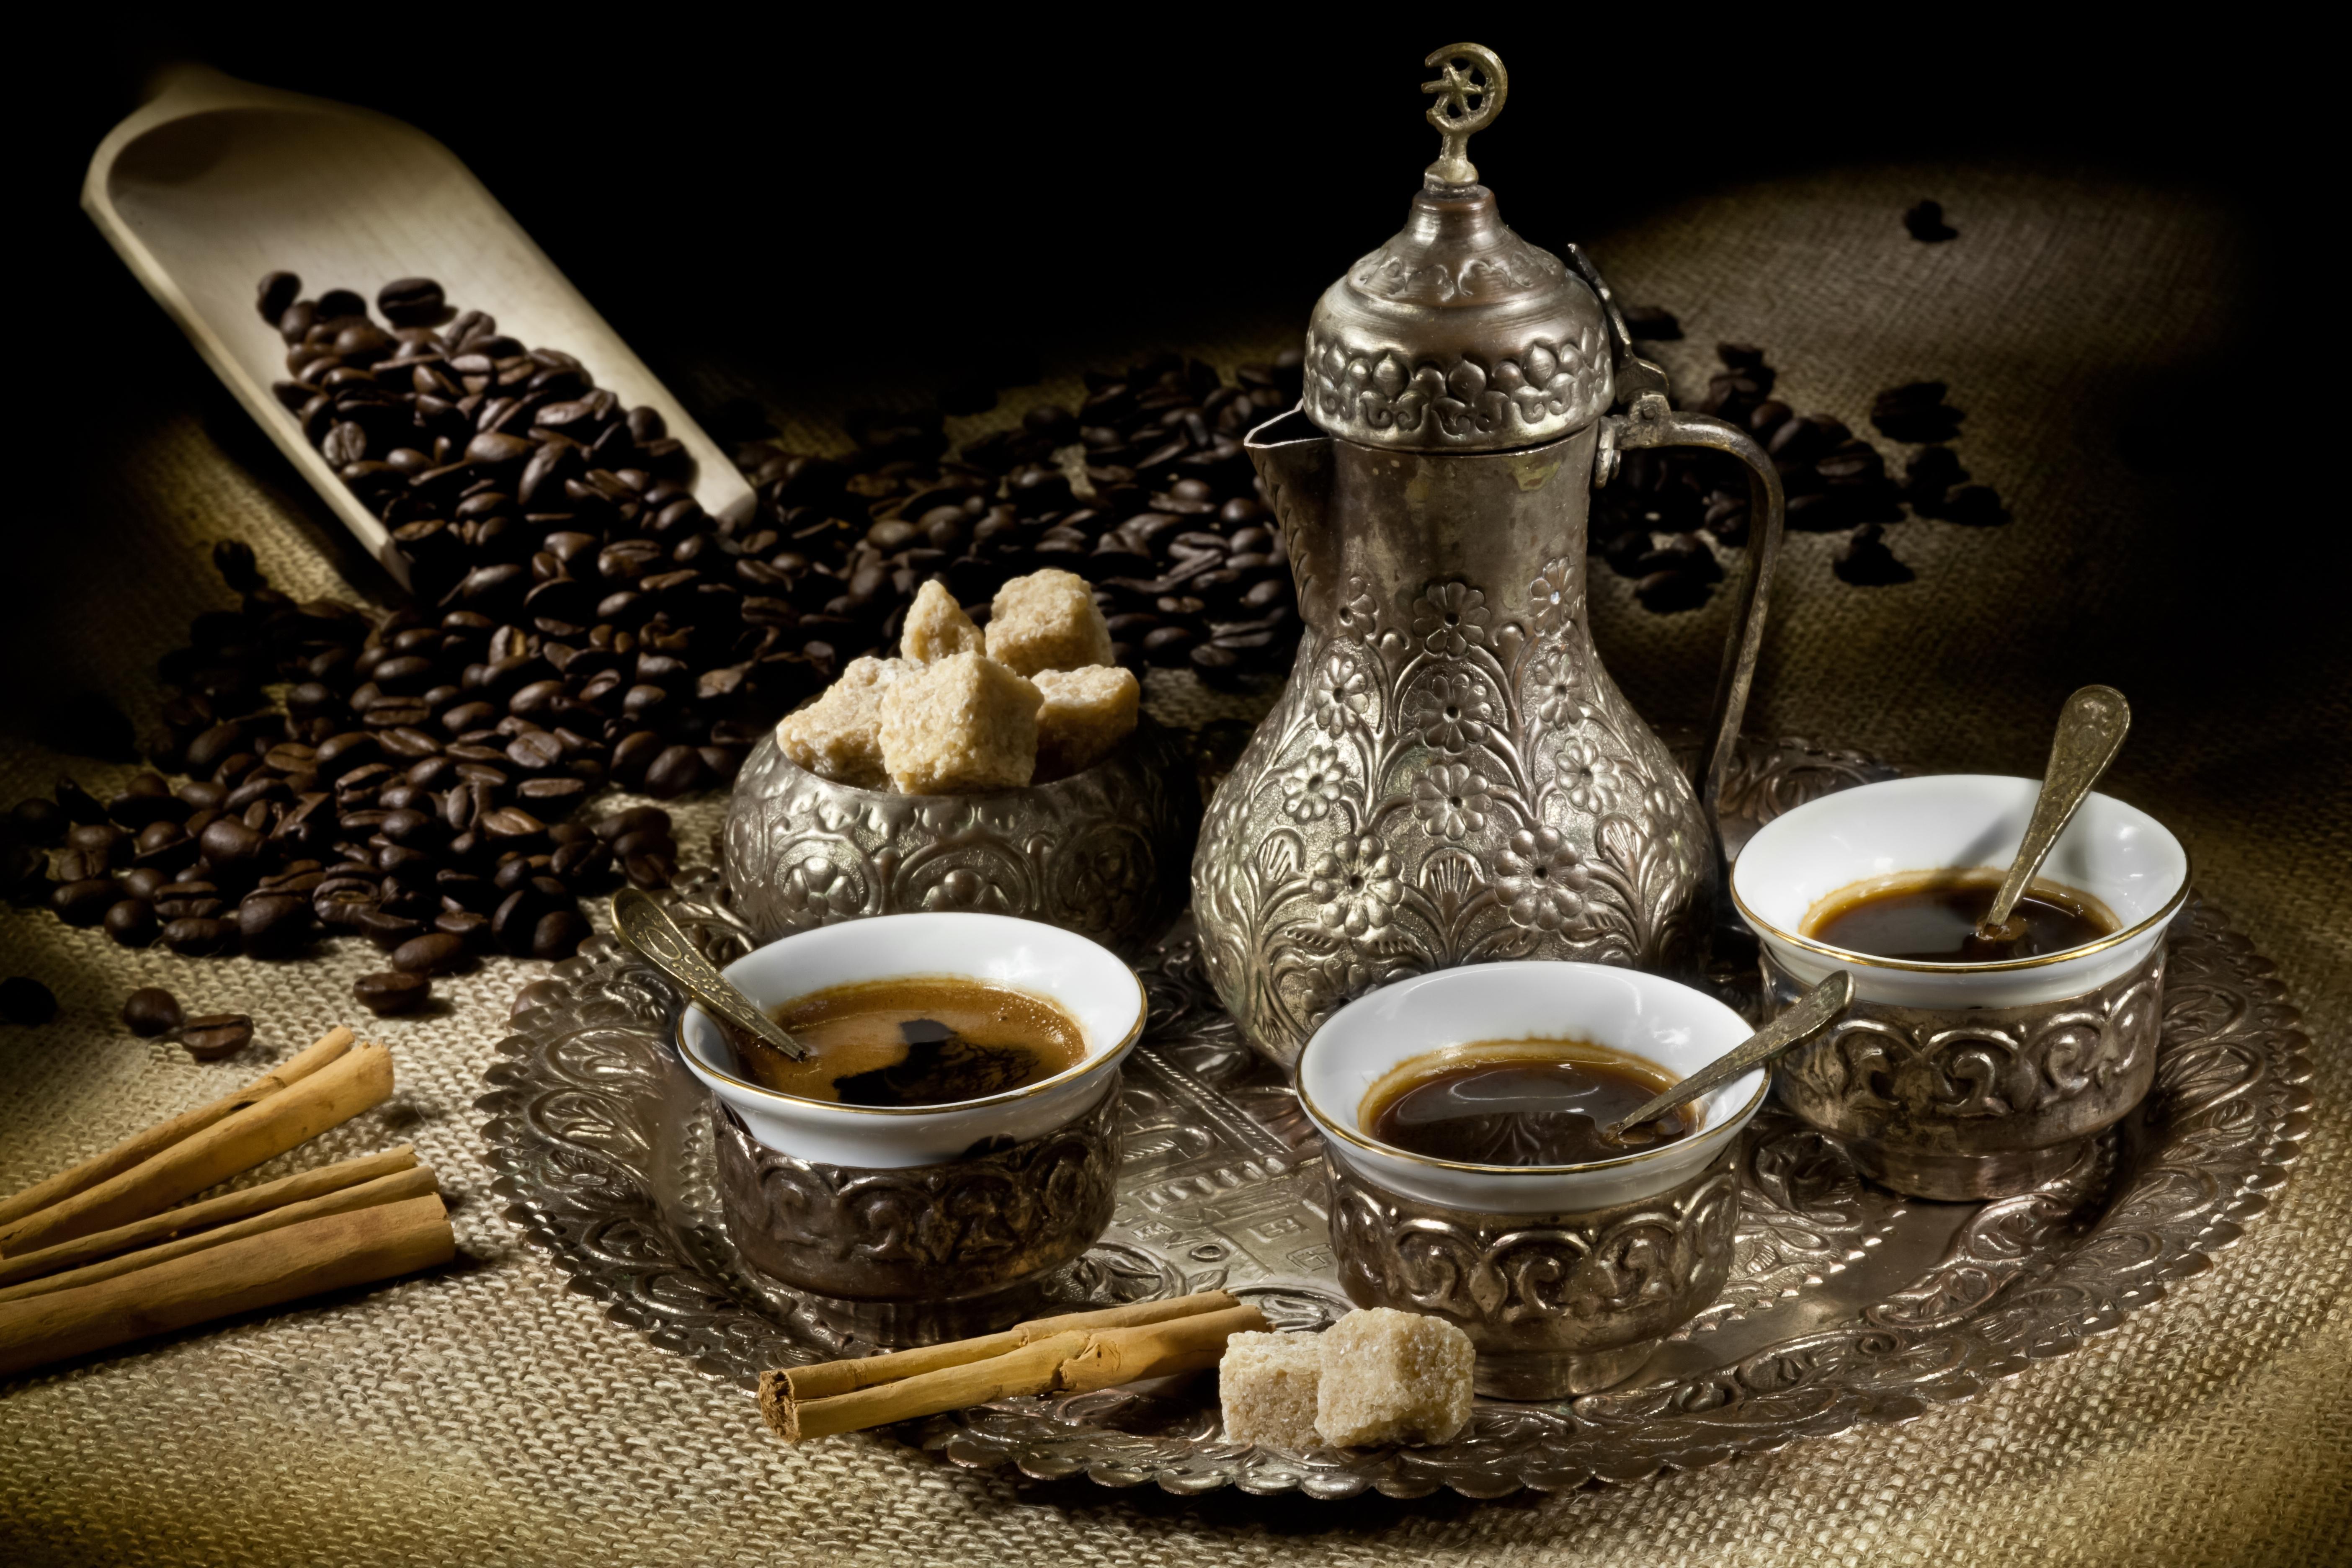 печете булочки чай кофе фотообои появился